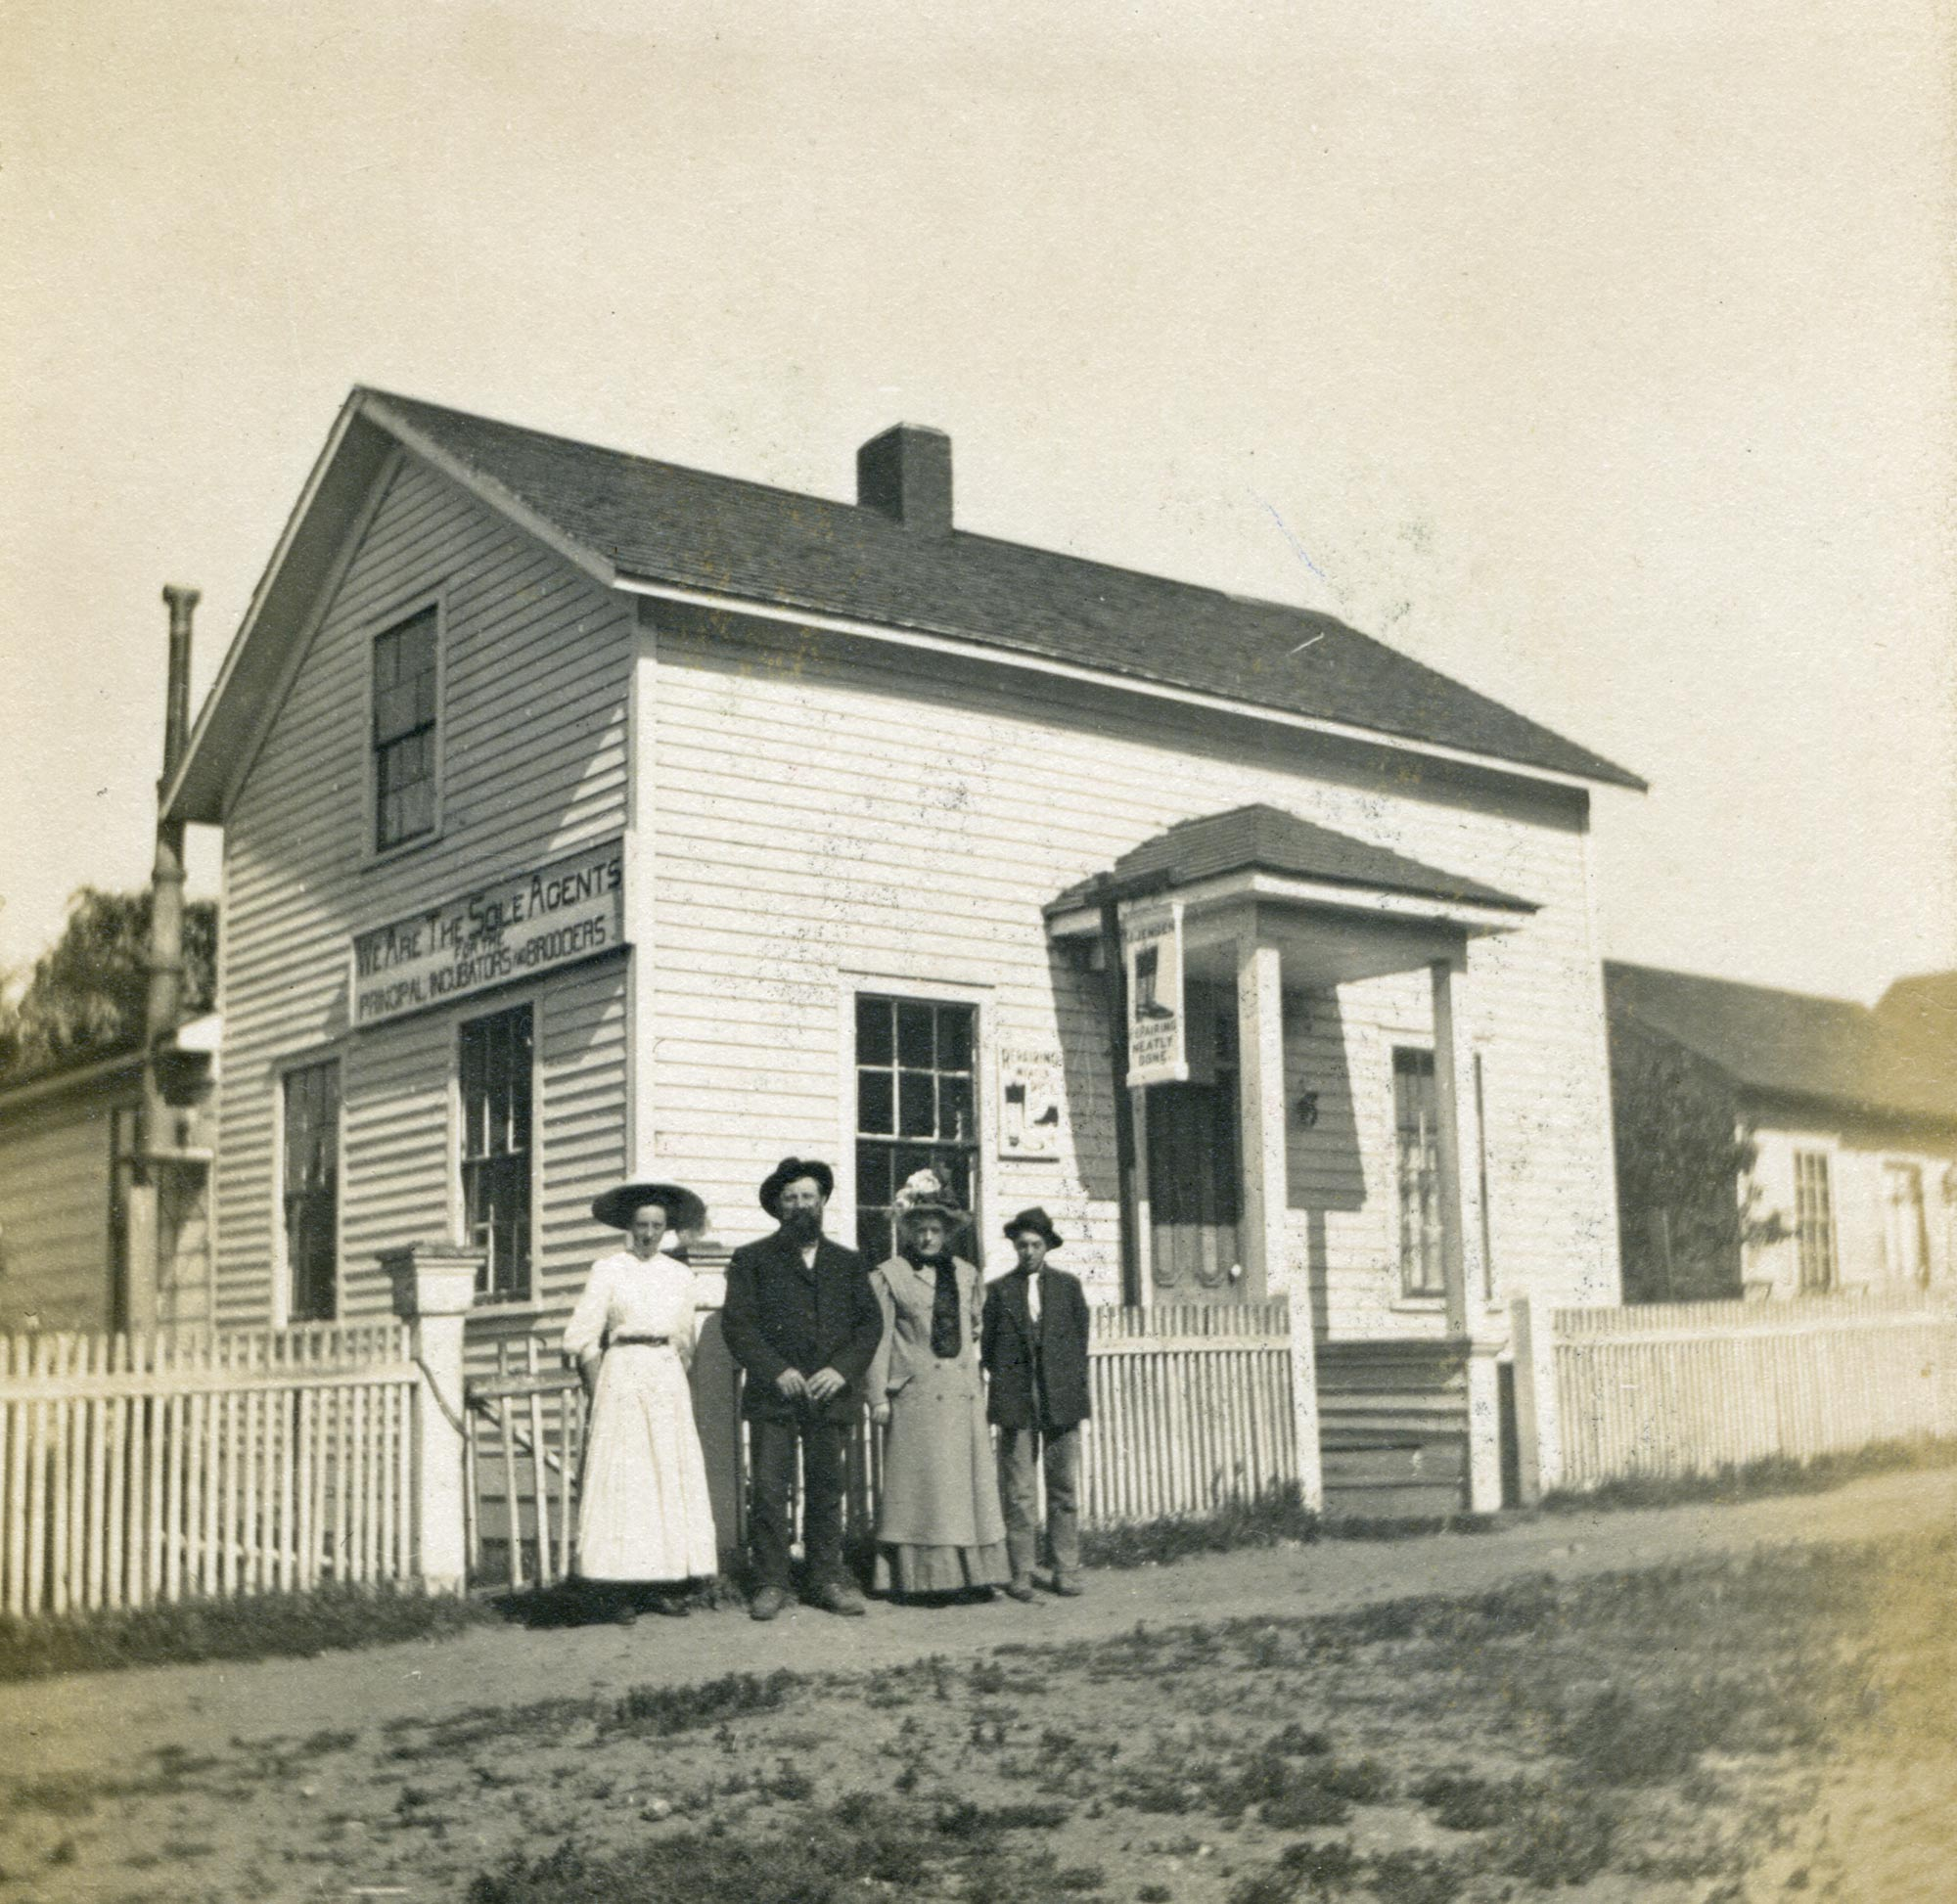 Jorgen Jensen Family and House